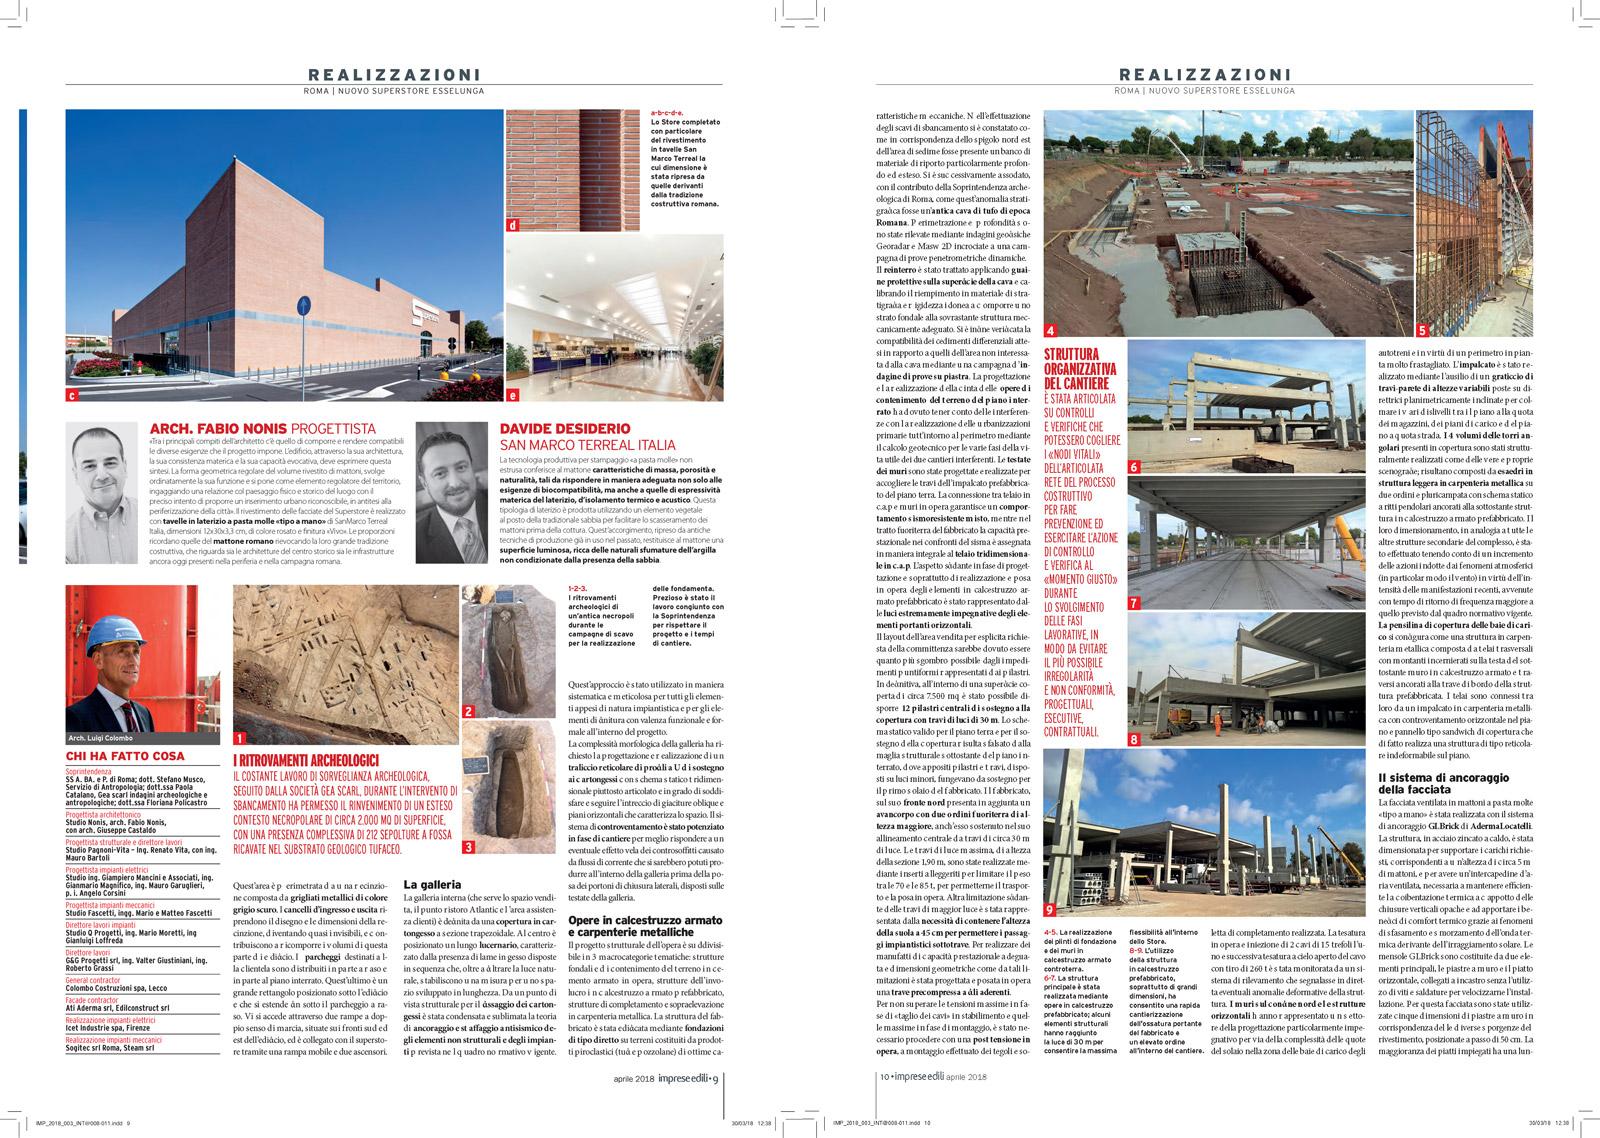 Imprese Edili, n°3, aprile 2018, anno XXVIII